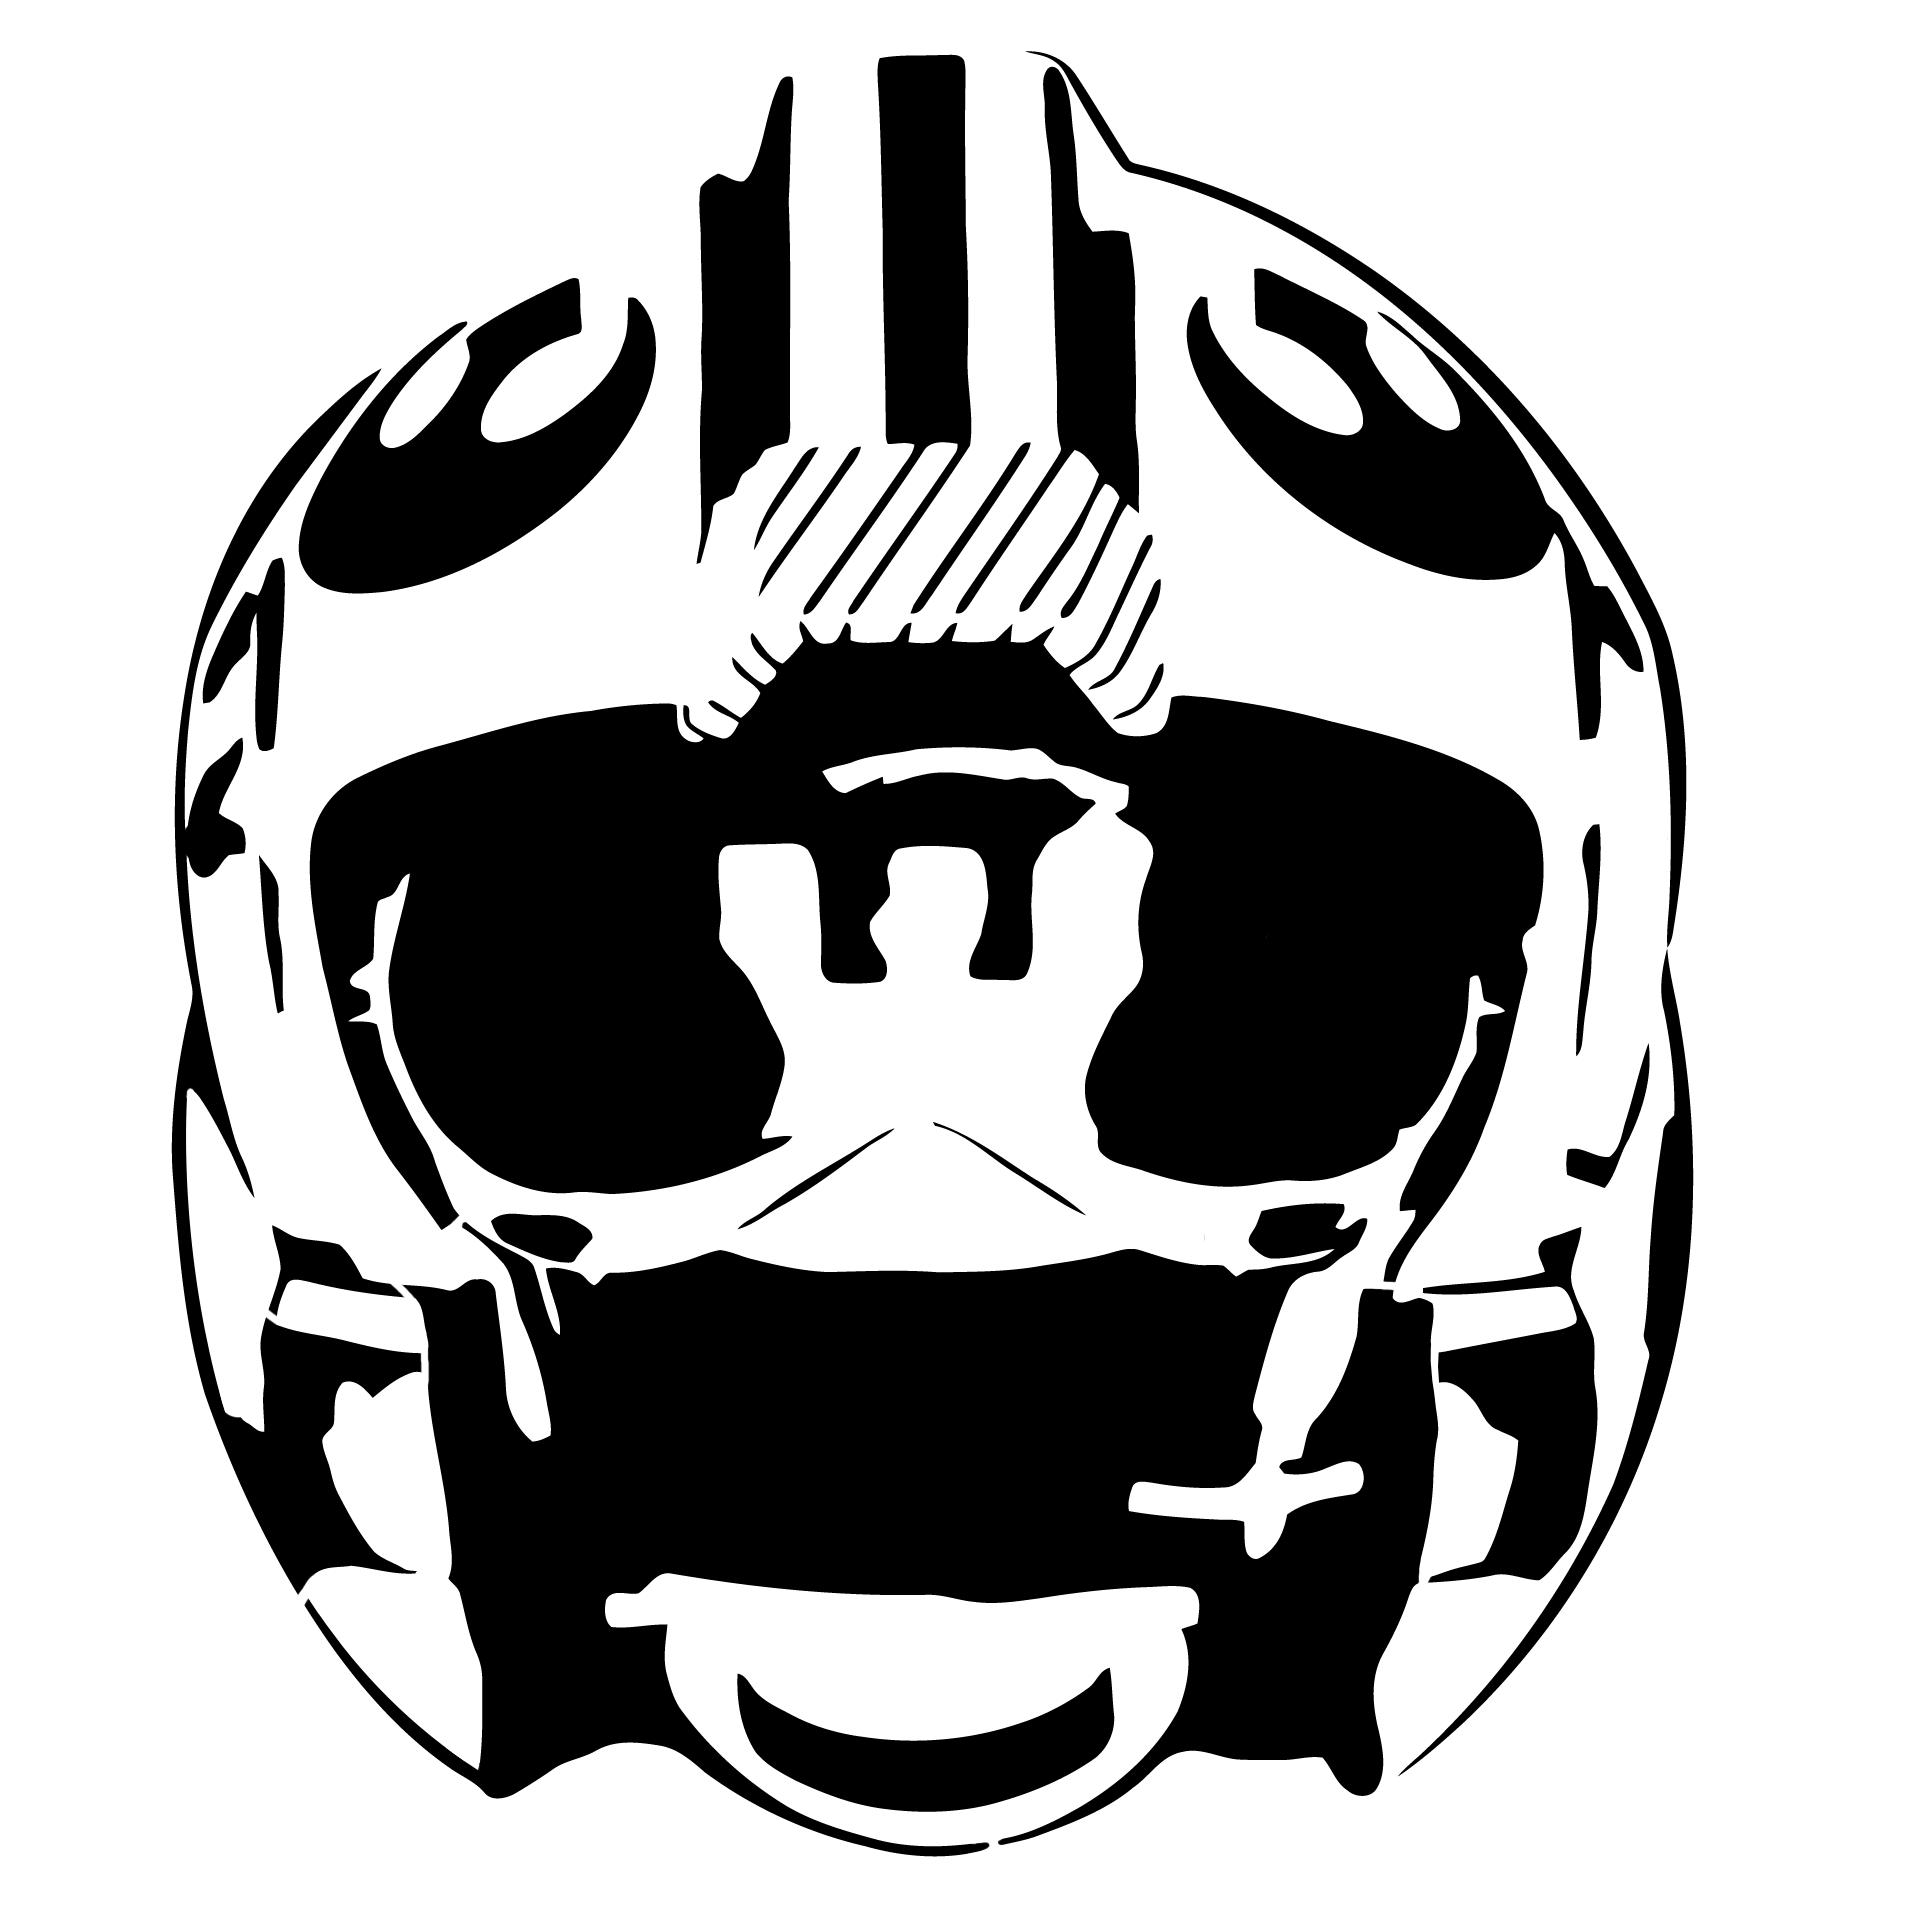 Alliance Fighter Pilot Helmet Stencil Template